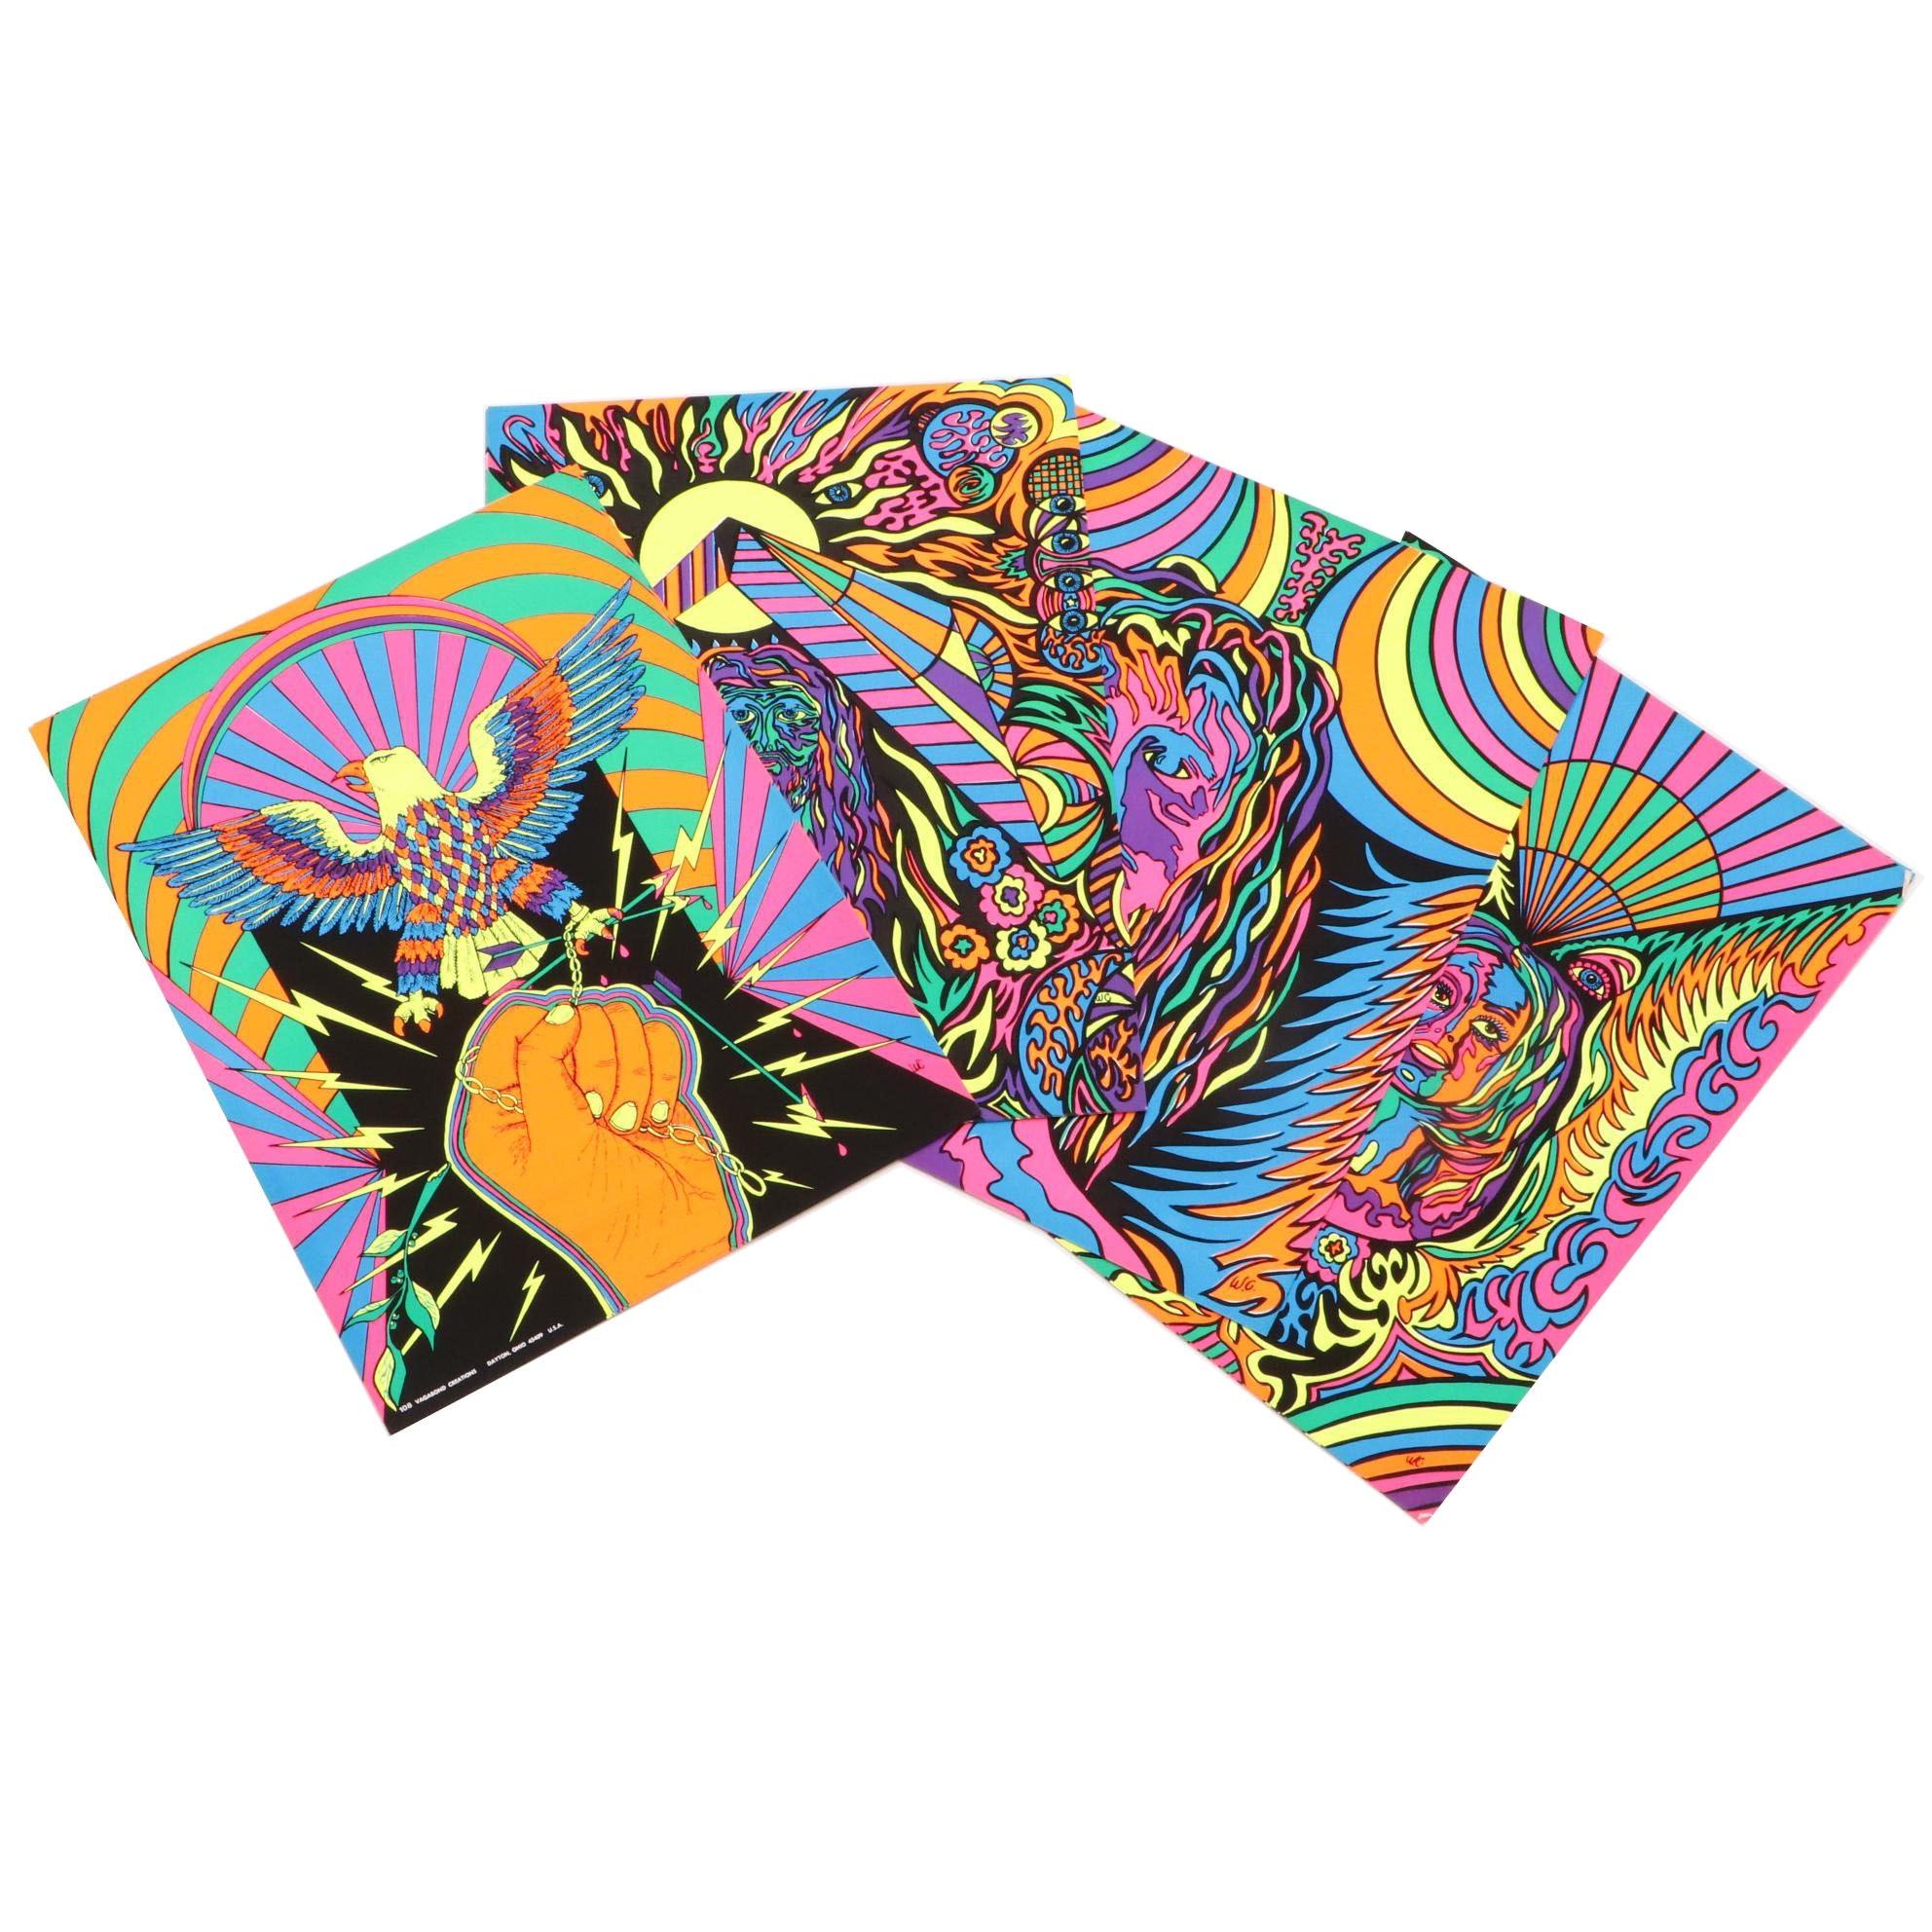 Psycehdelic 1970s Vagabond Creations Blacklight Posters